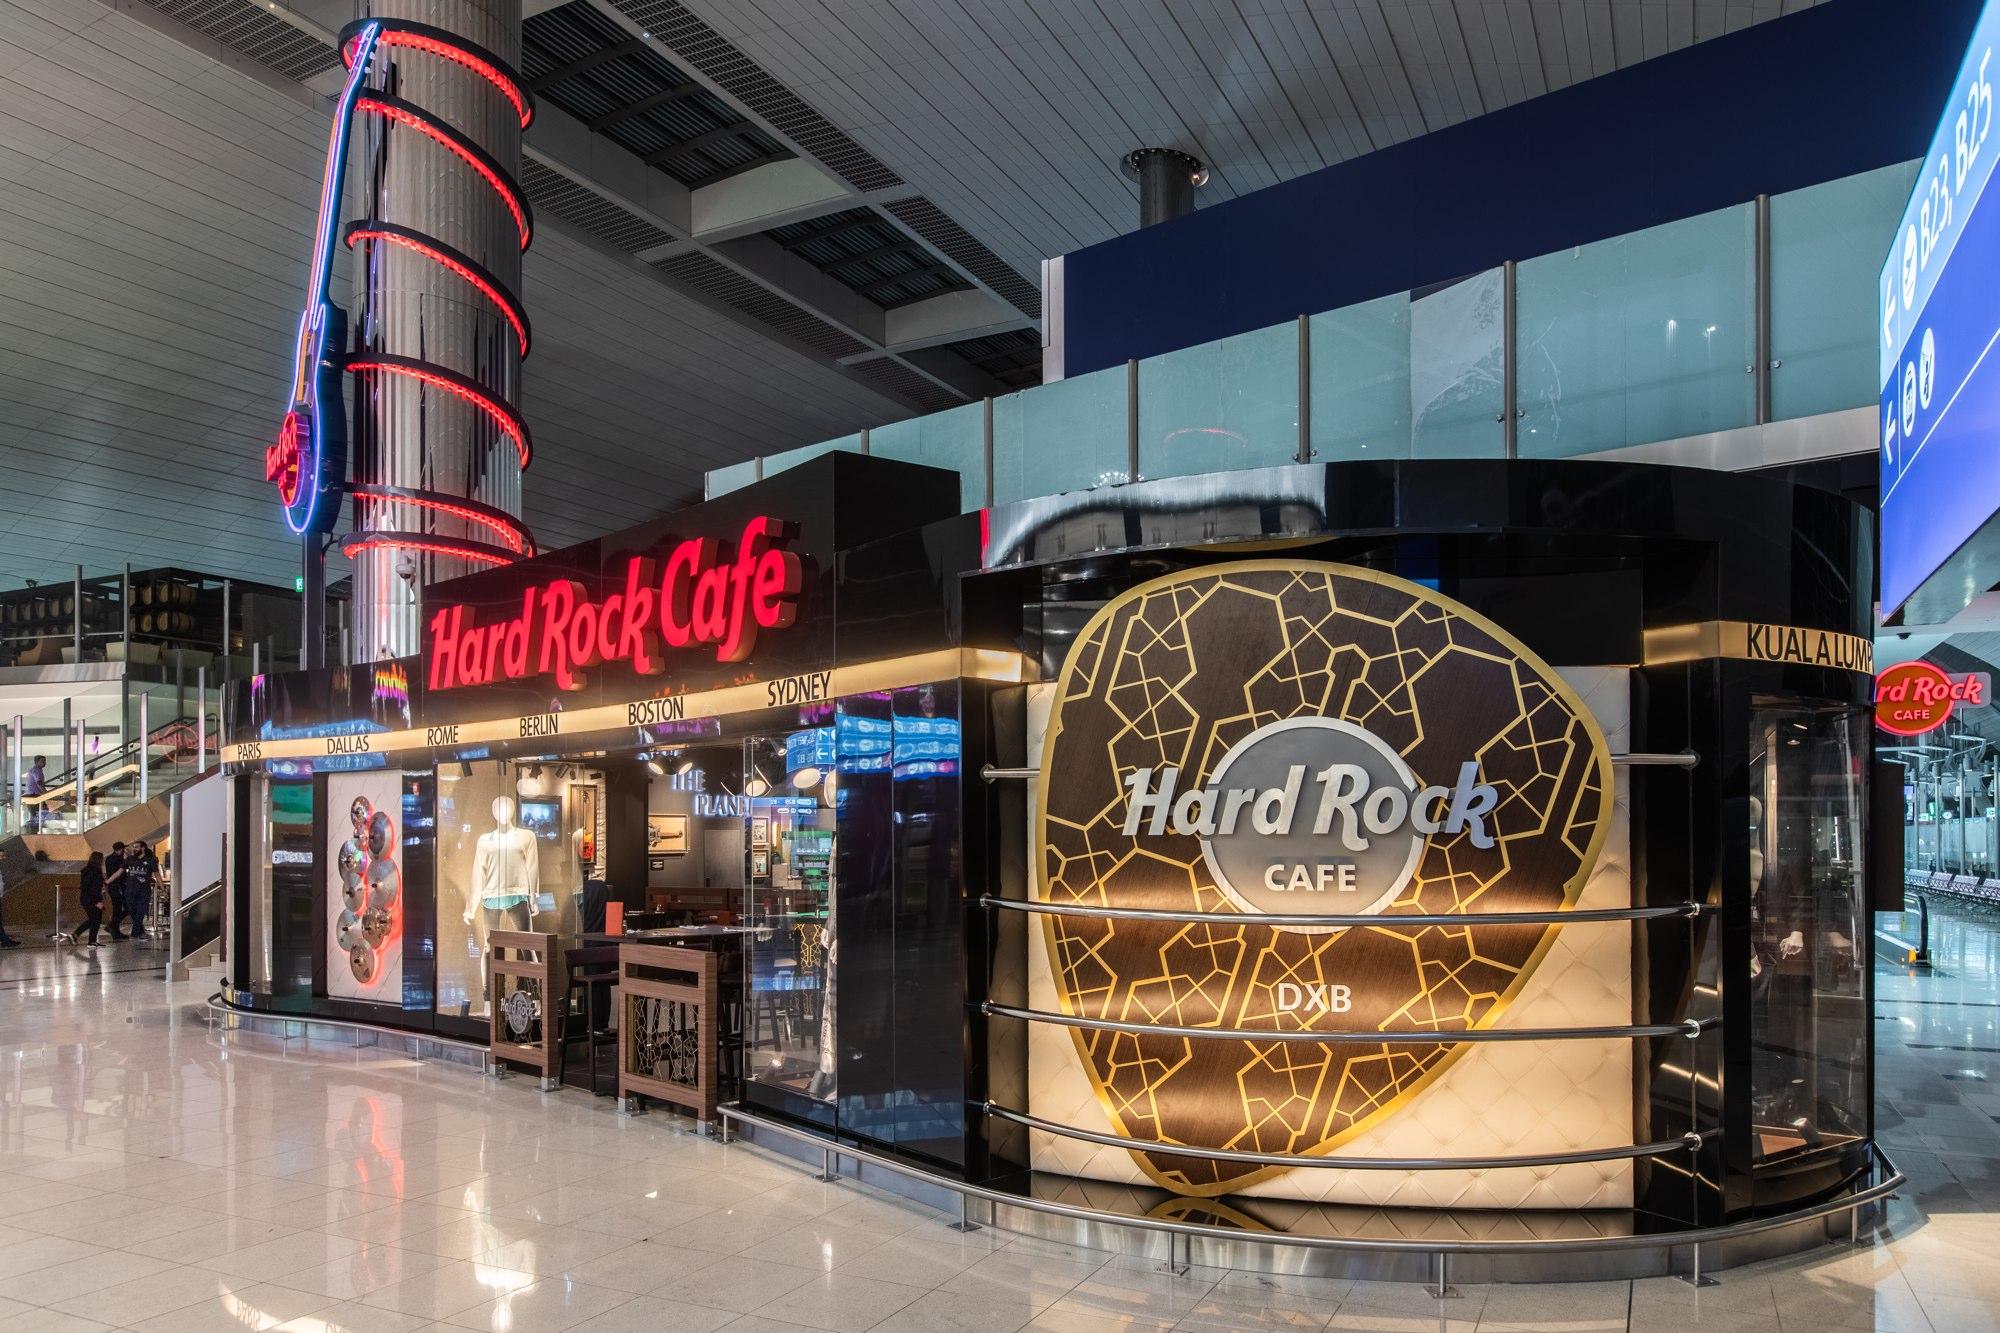 hardrock-cafe-dubai62018-11-17-05-54-32